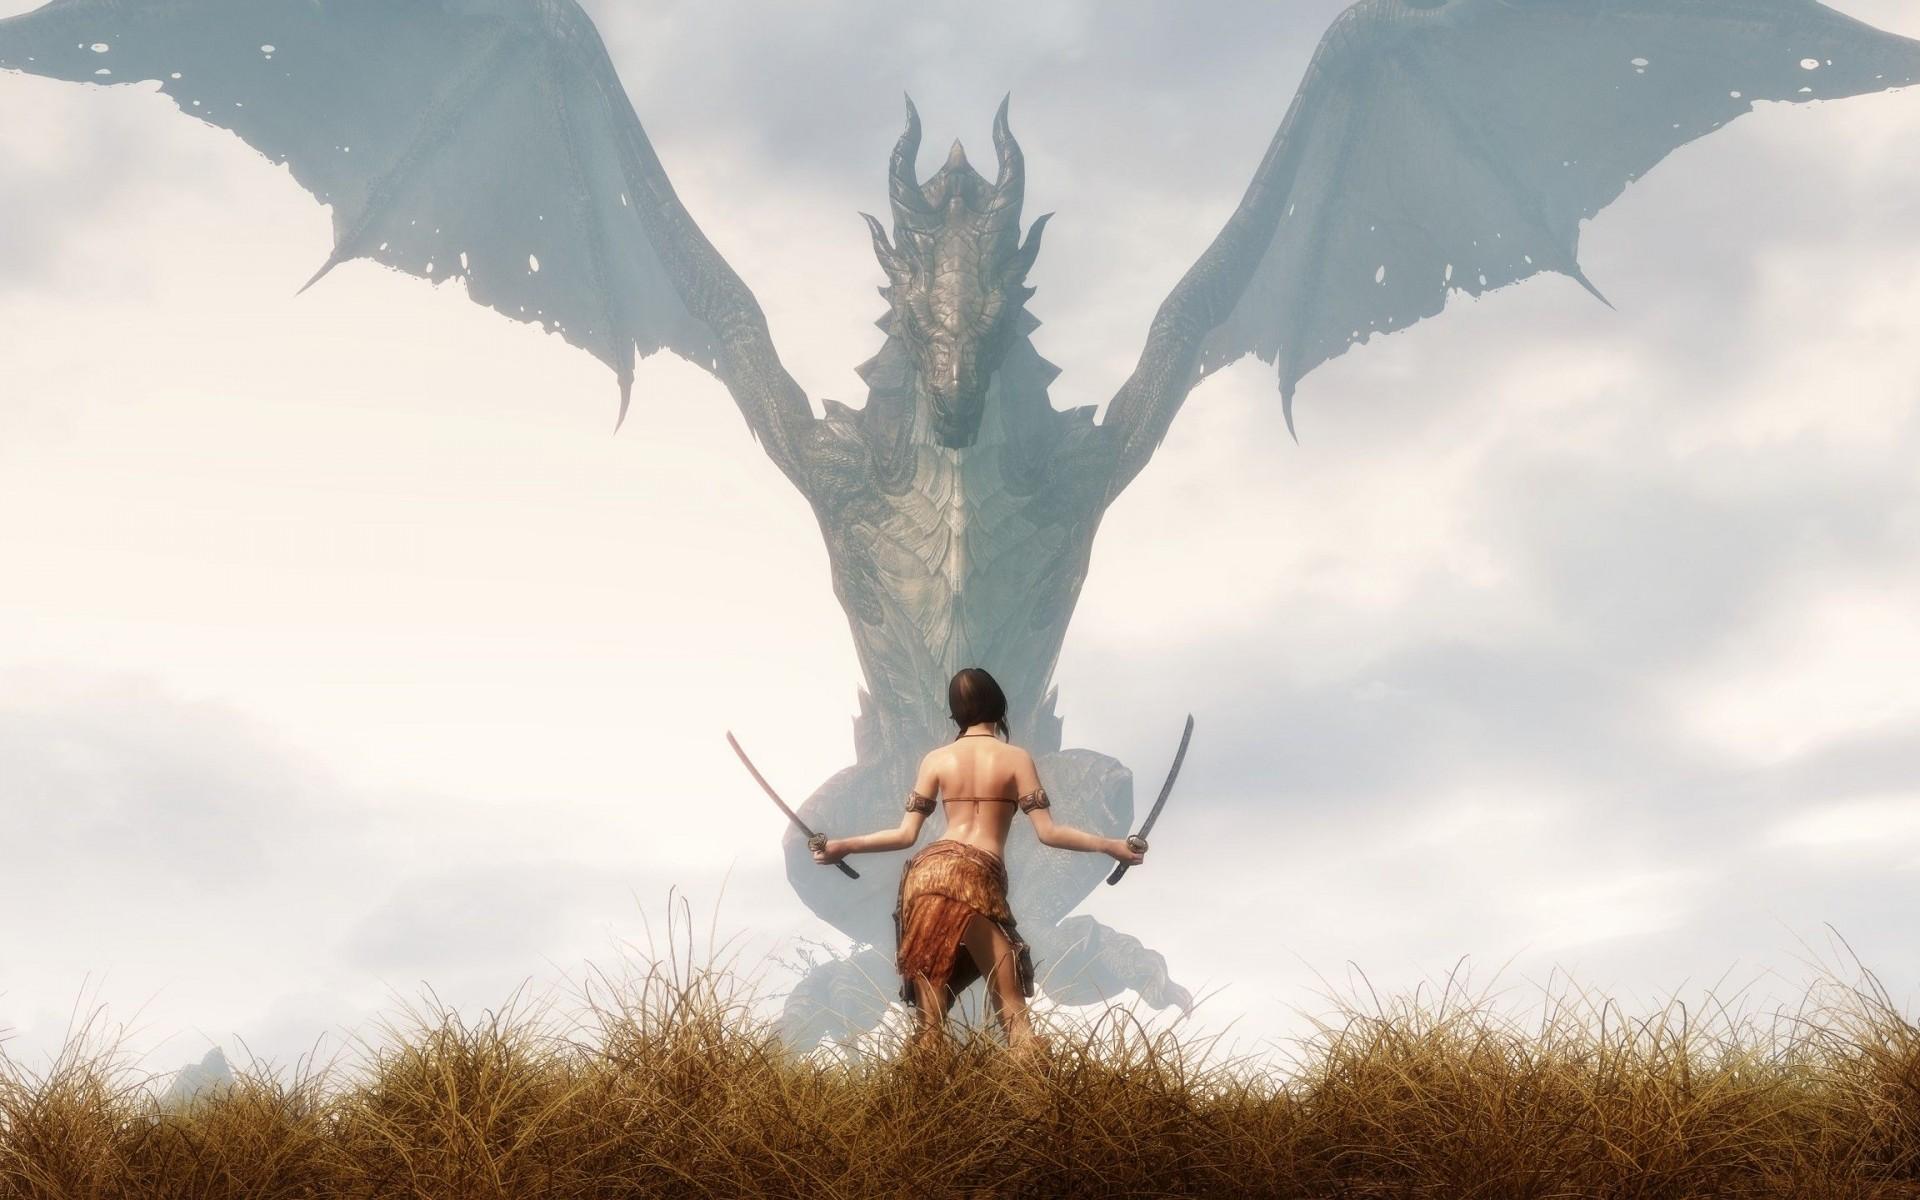 Dragons Swords The Elder Scrolls V Skyrim Wallpaper